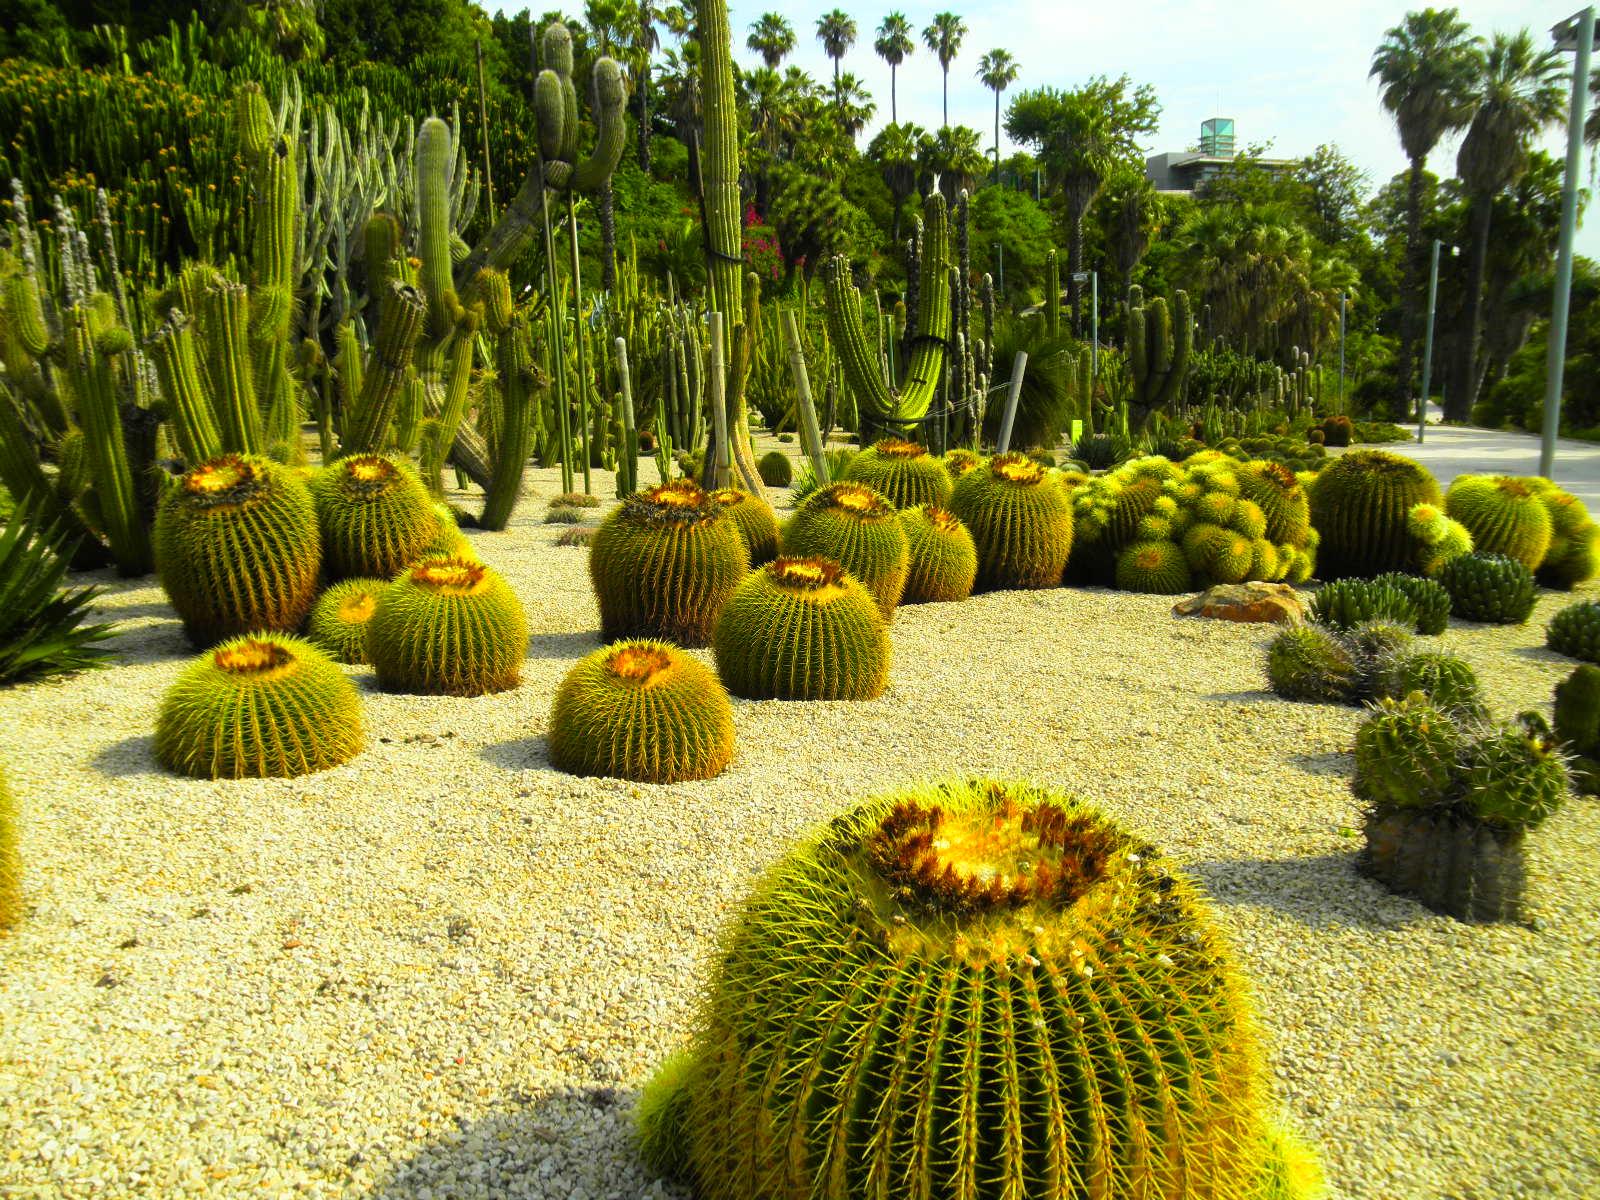 Jardines de cactus fotos de naturaleza for Fotos de cactus